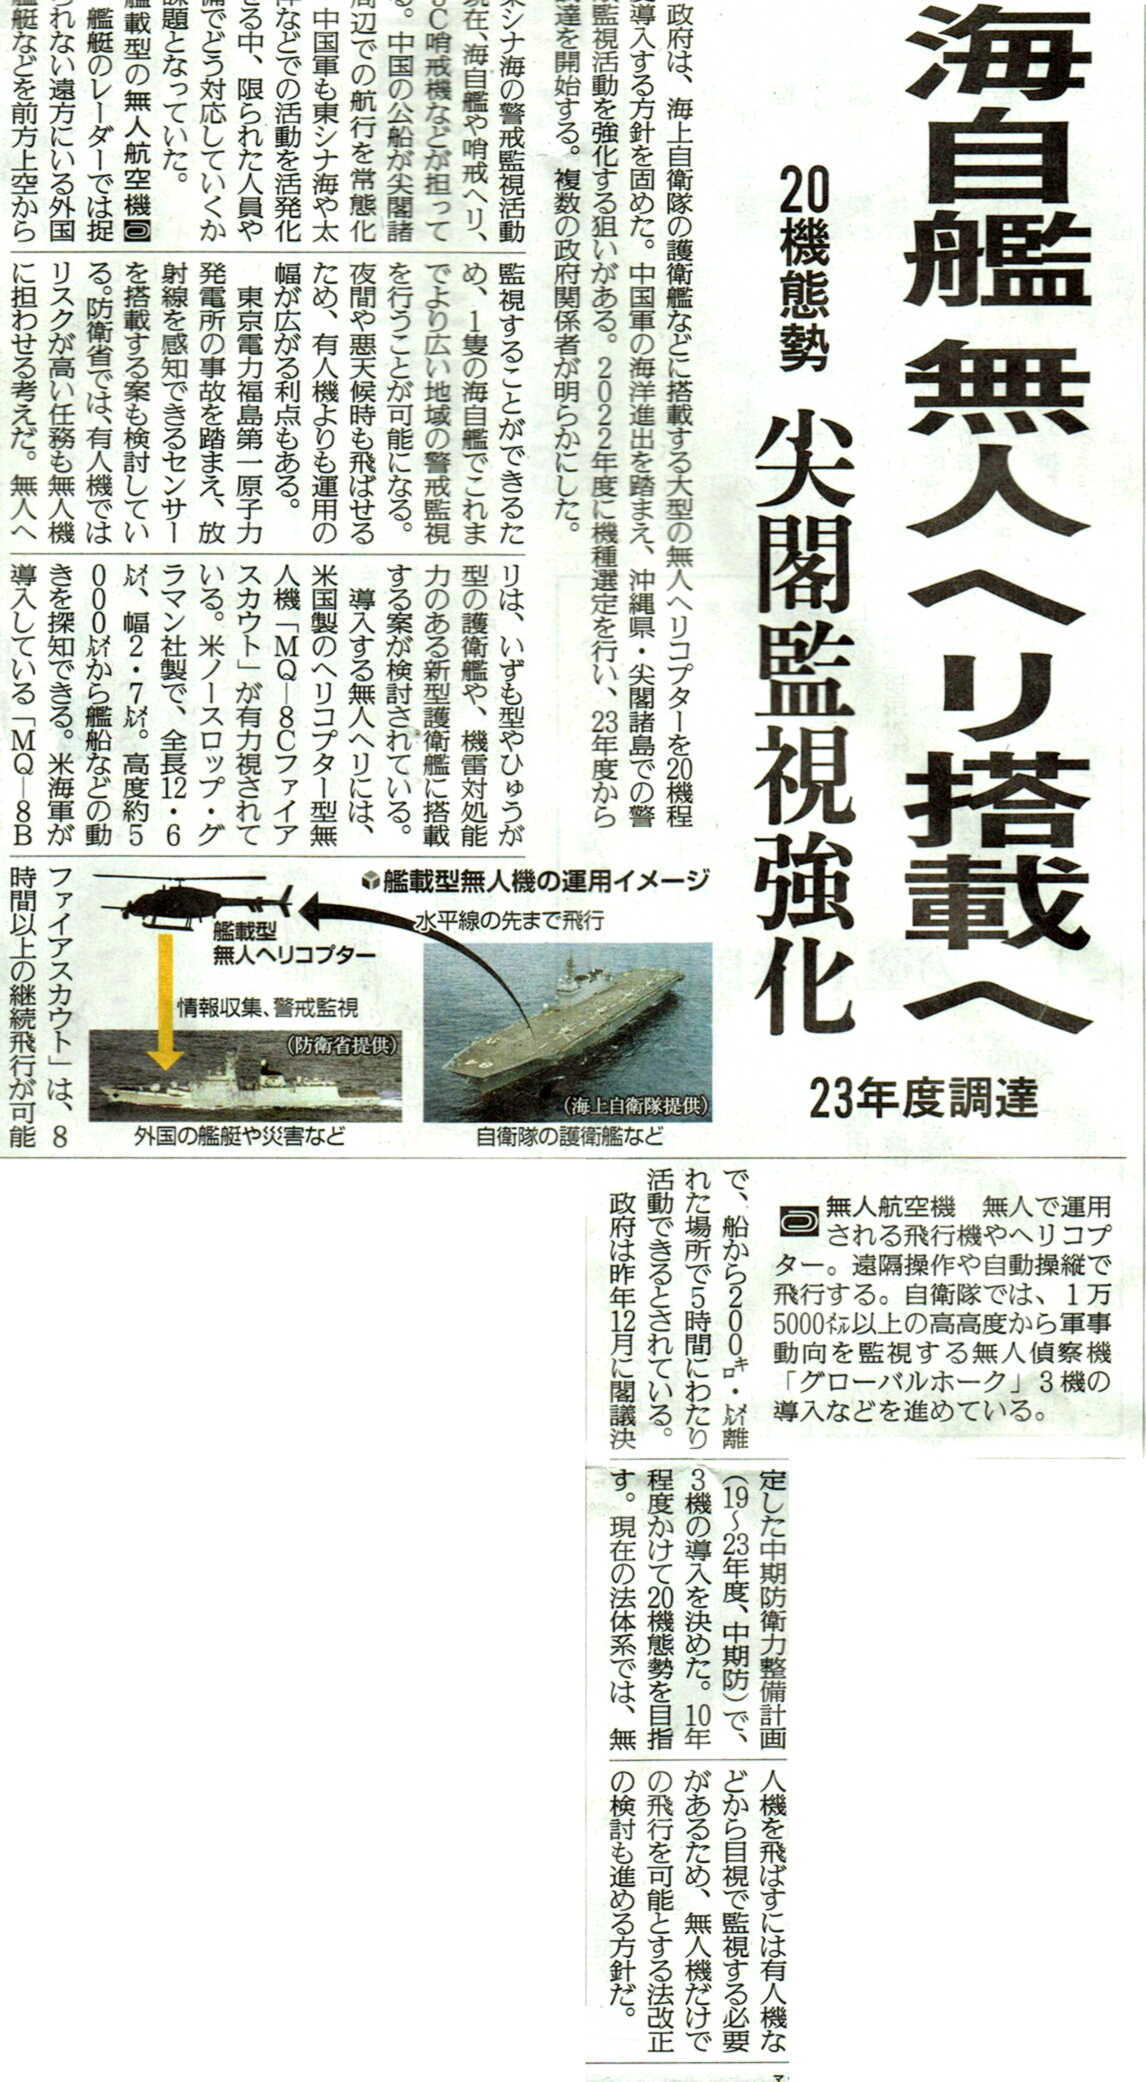 yomiouri2019 07281